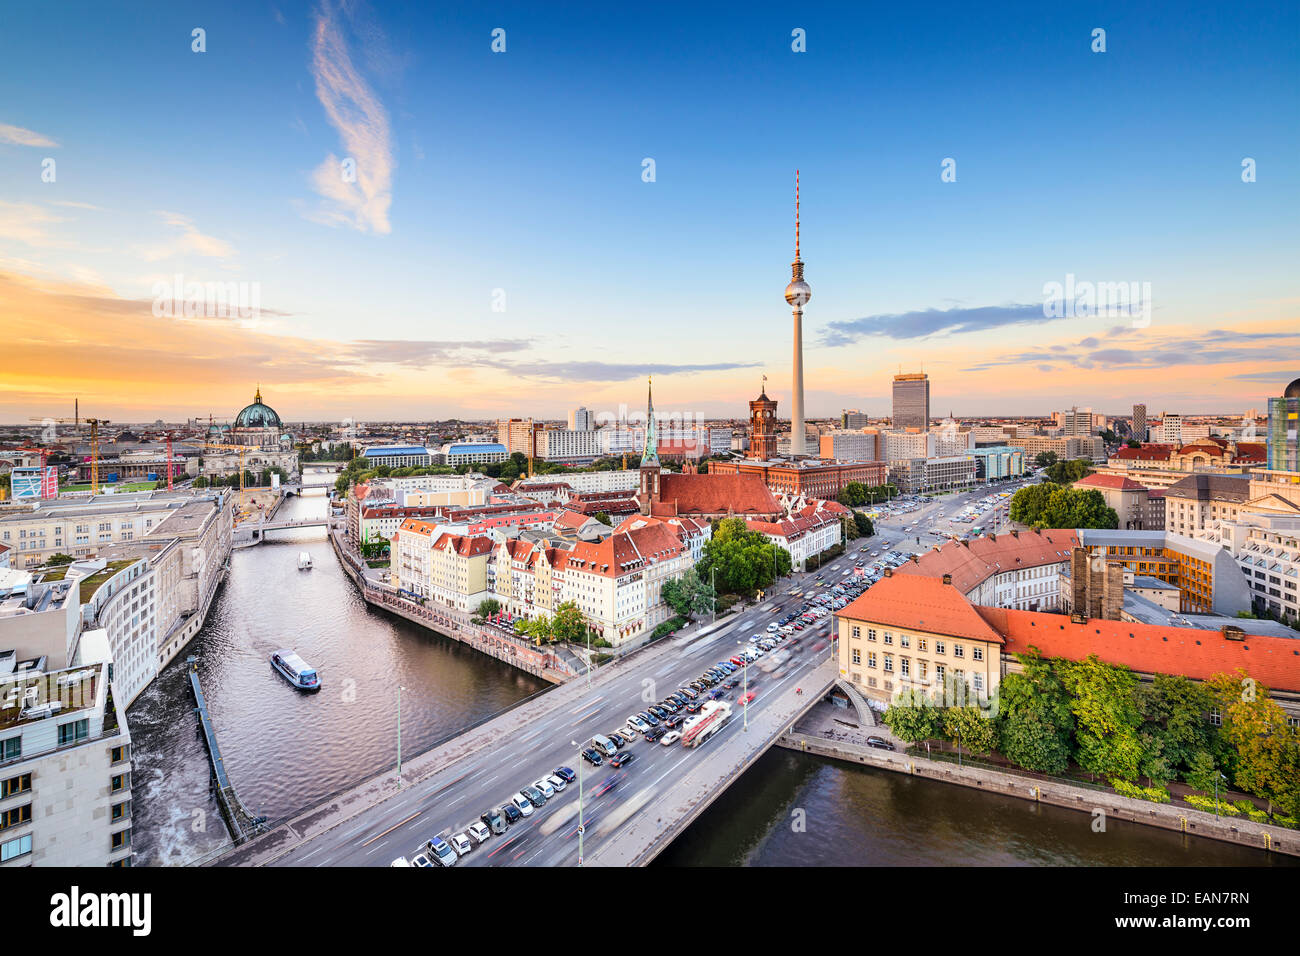 Berlin, Allemagne skyline sur la rivière Spree. Photo Stock